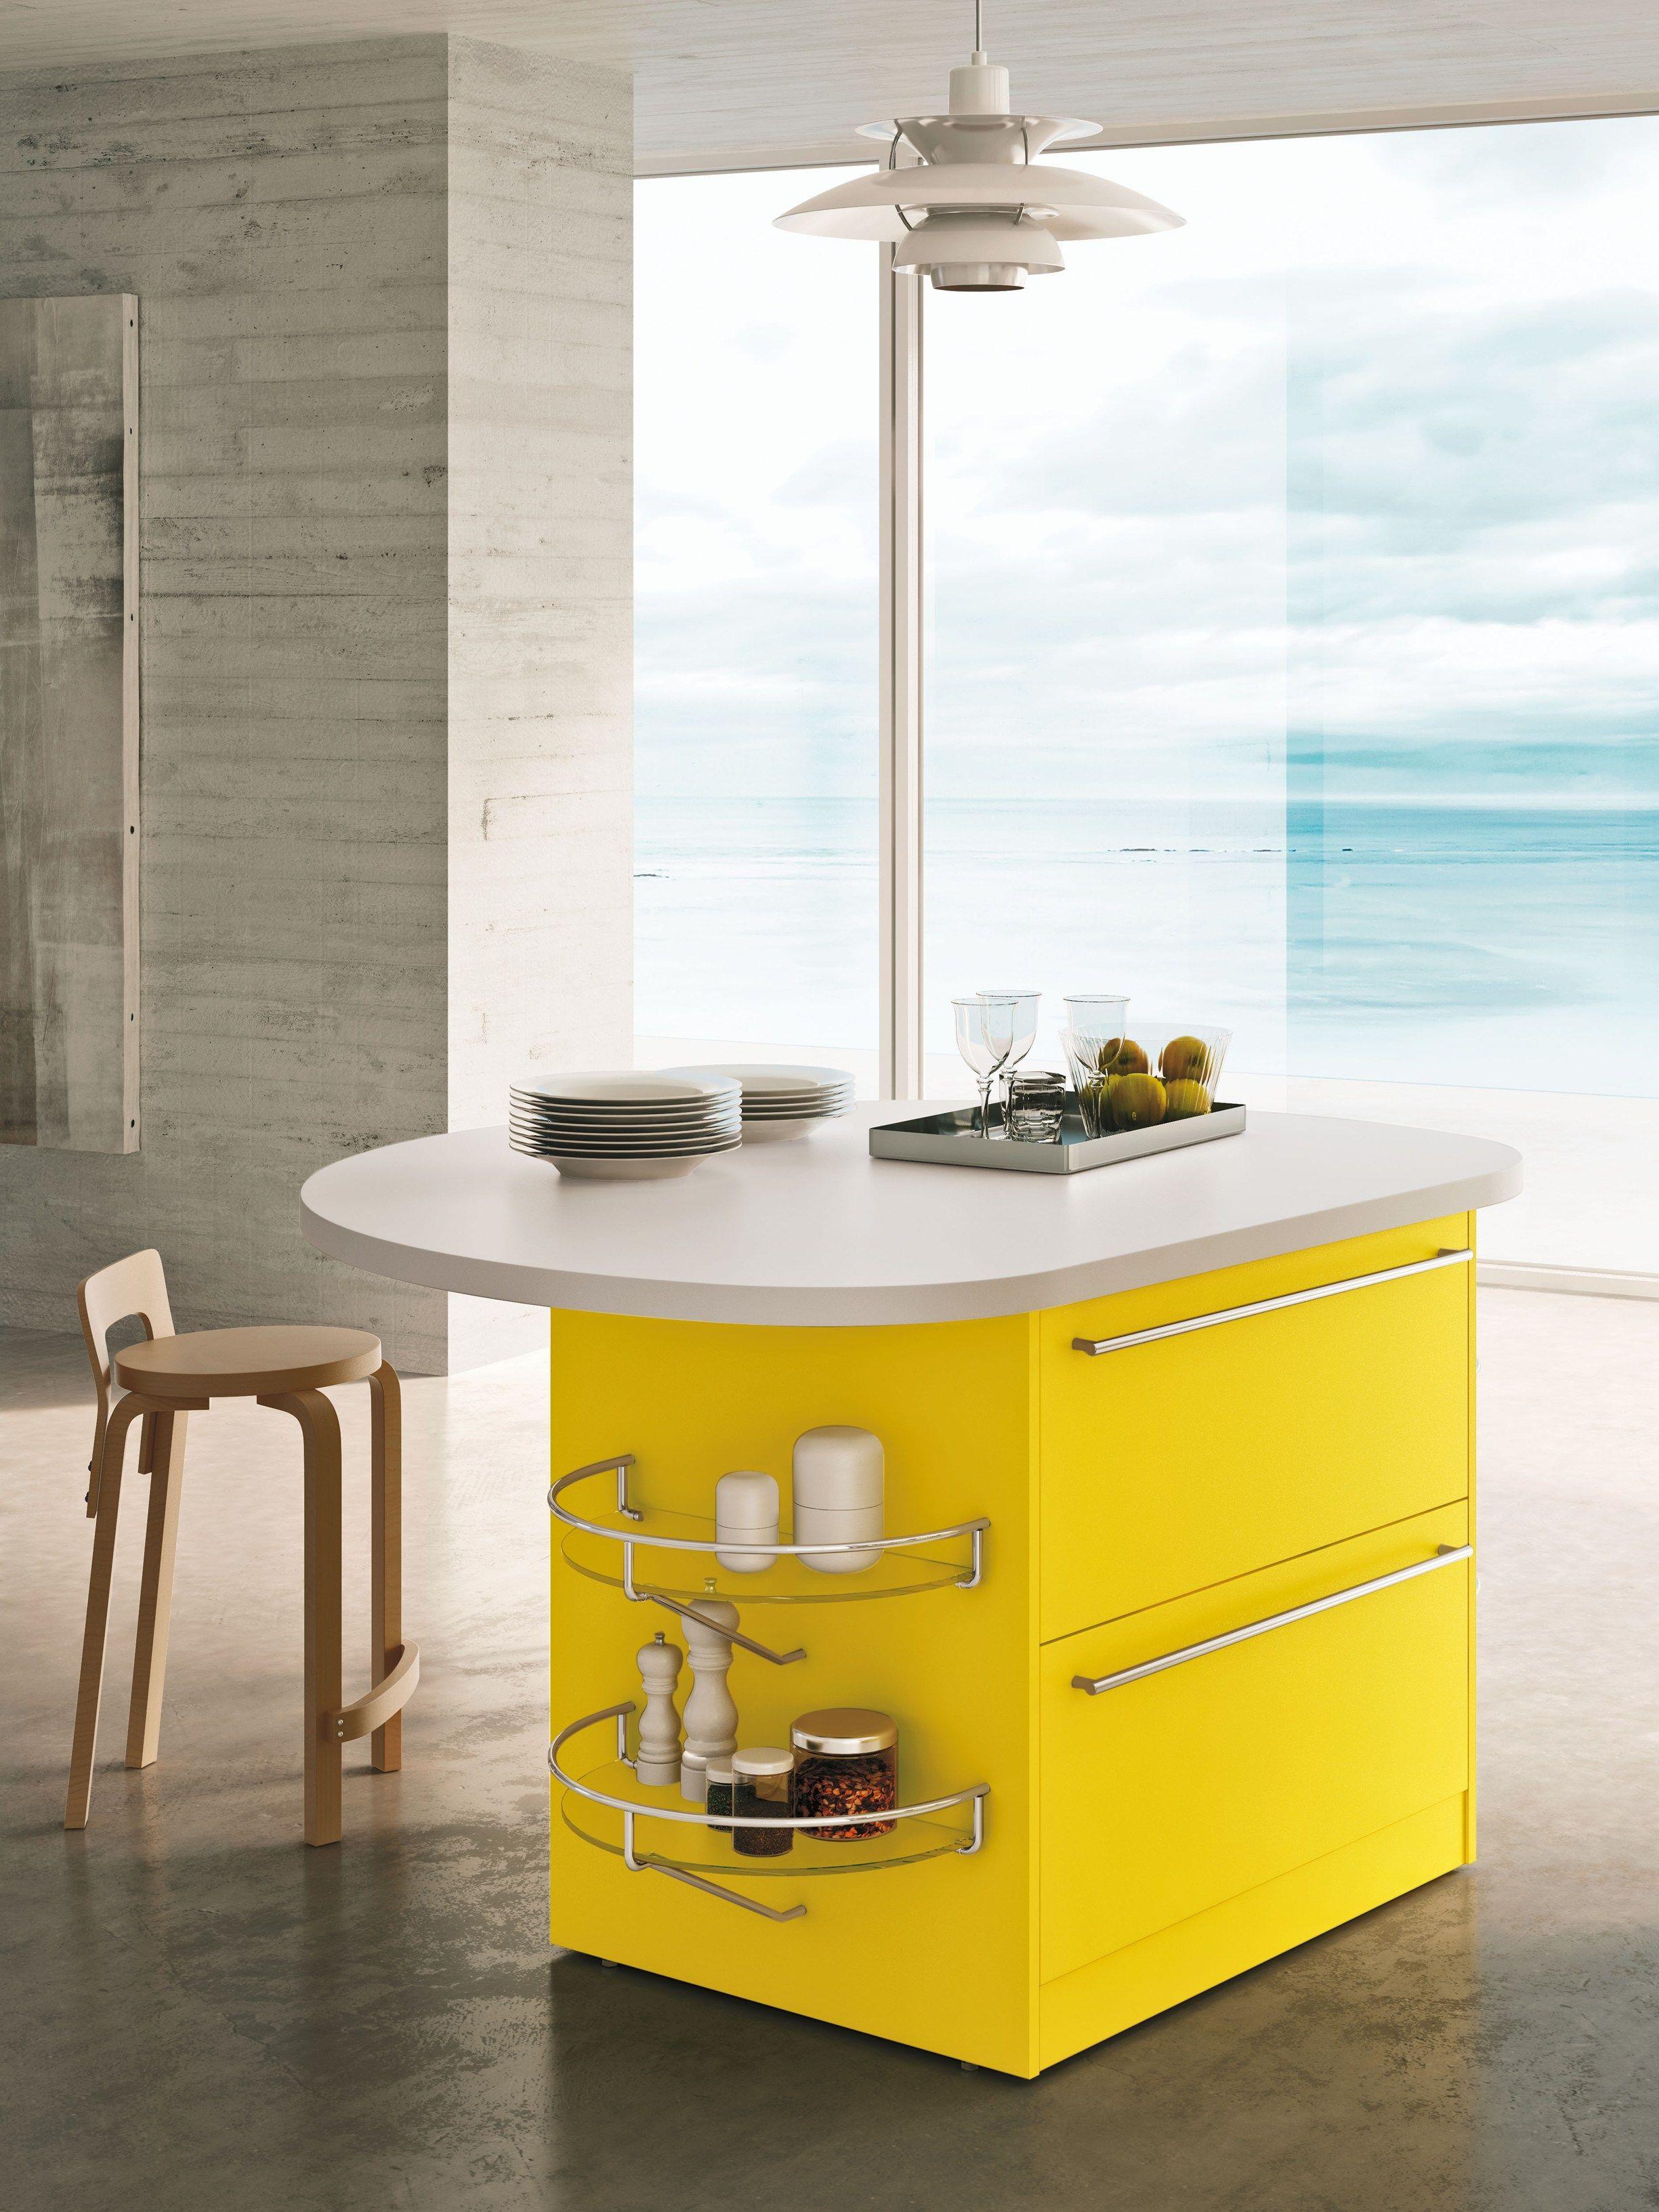 Skyline 2.0 cuisine avec îlot by snaidero design lucci orlandini